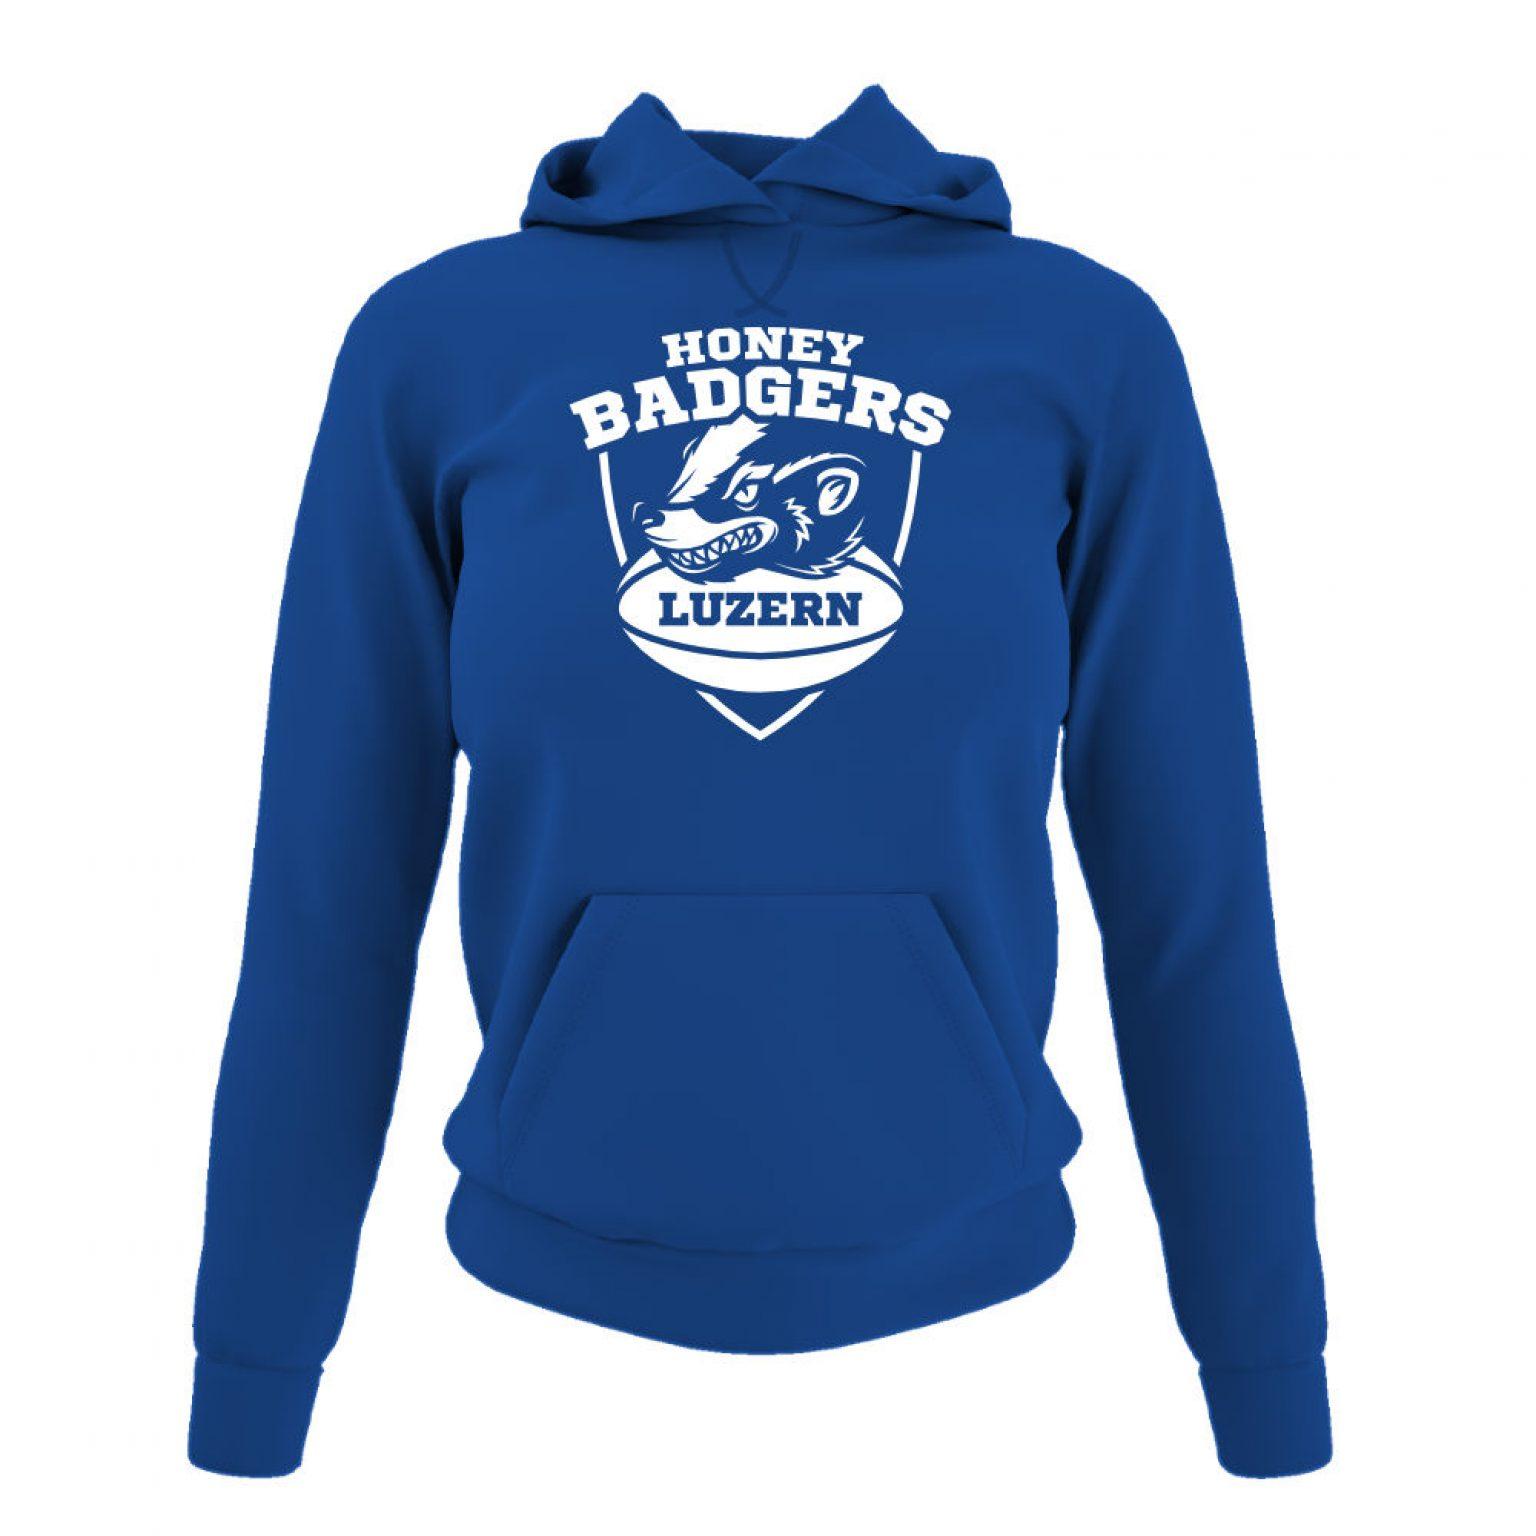 Honeybadgers hoodie damen blue